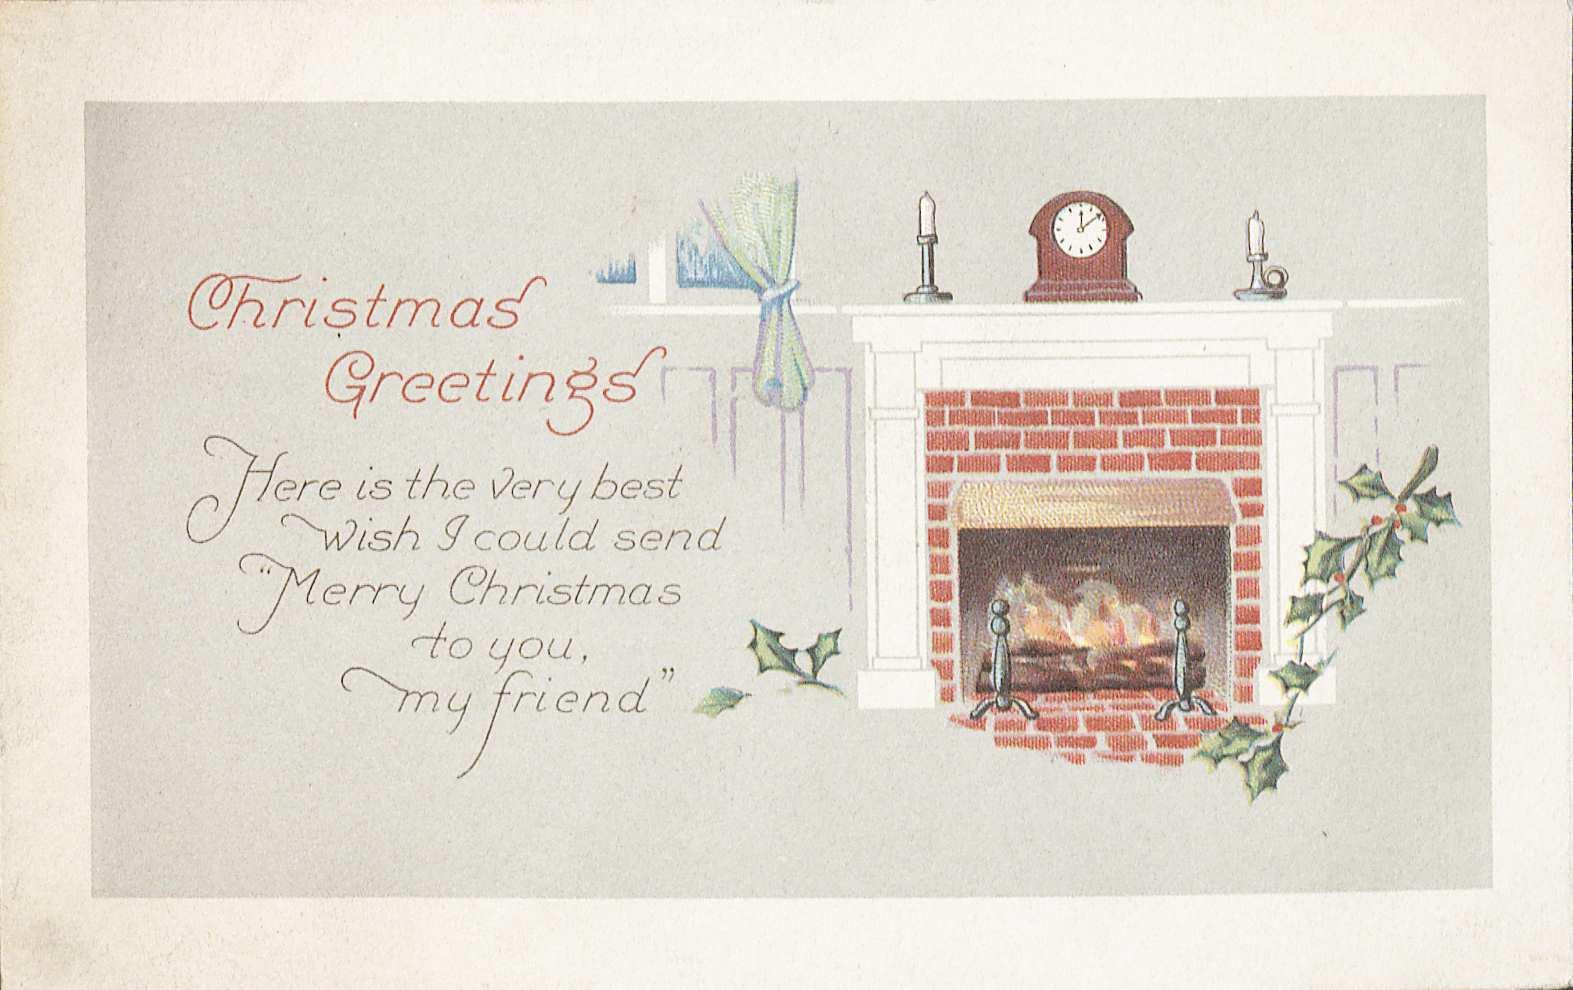 Christmas postcard (Image by Petrina Jackson)